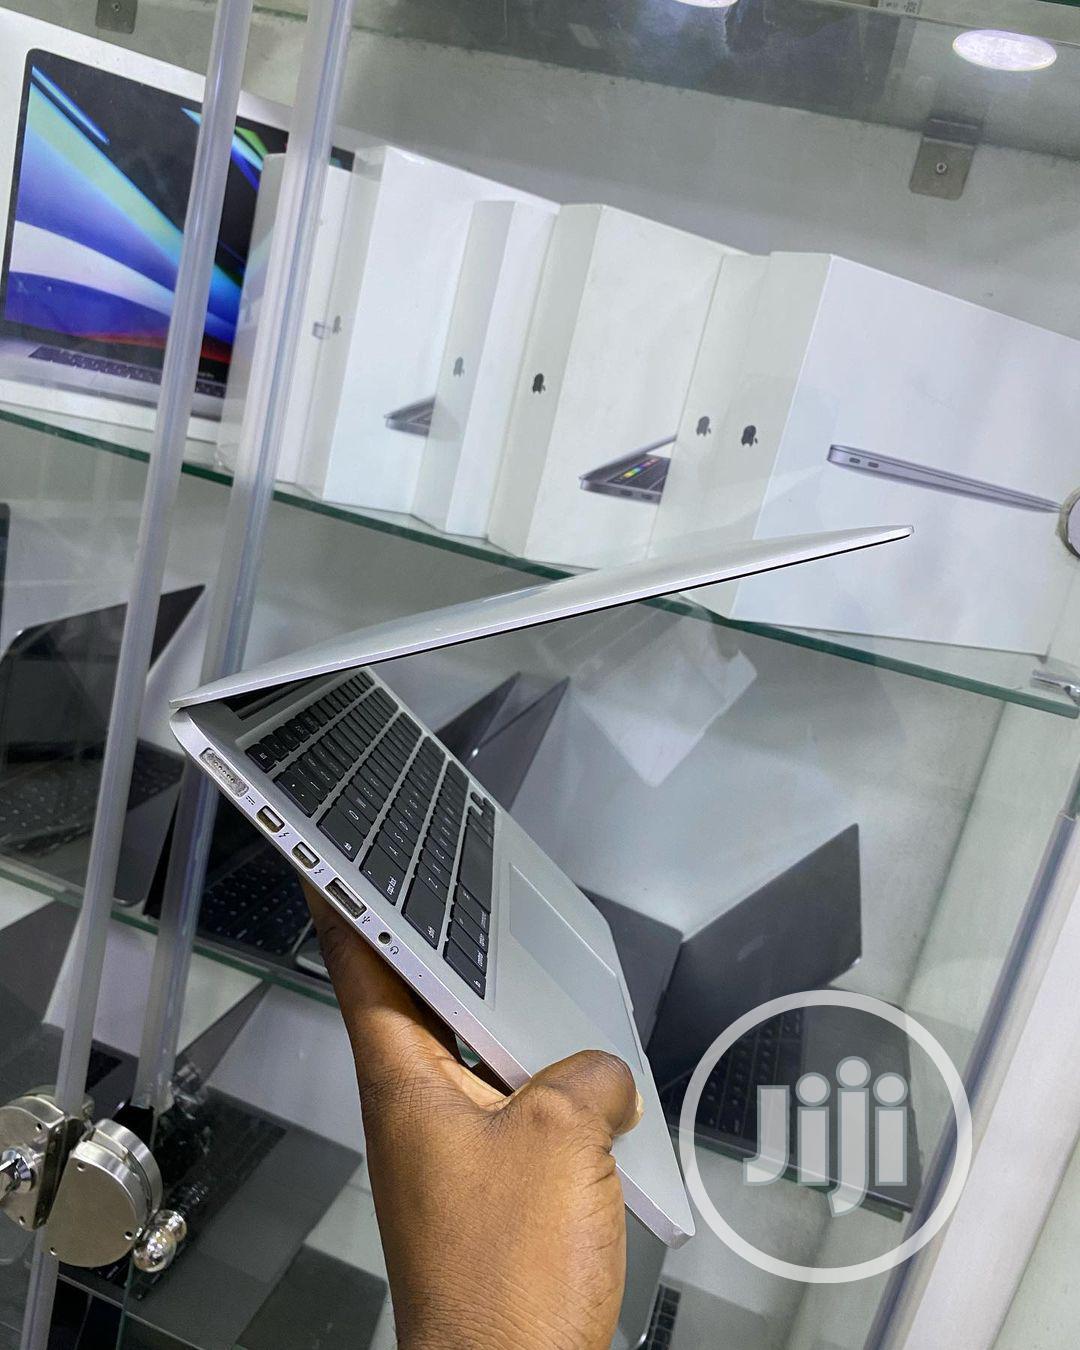 Laptop Apple MacBook Pro 2015 8GB Intel Core I5 SSD 256GB   Laptops & Computers for sale in Ikeja, Lagos State, Nigeria